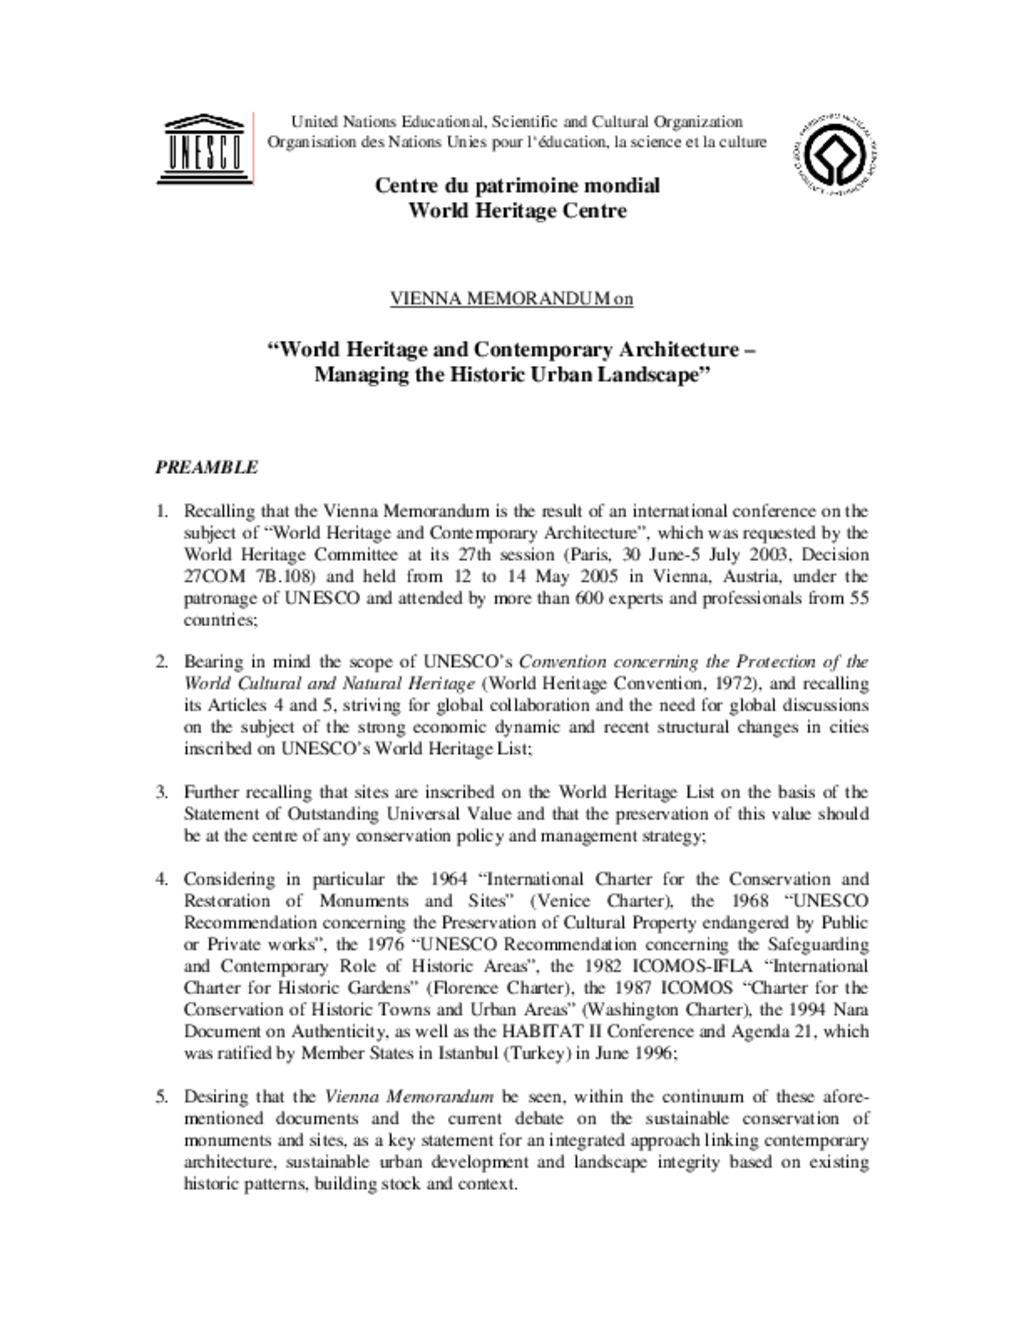 Vienna Memorandum